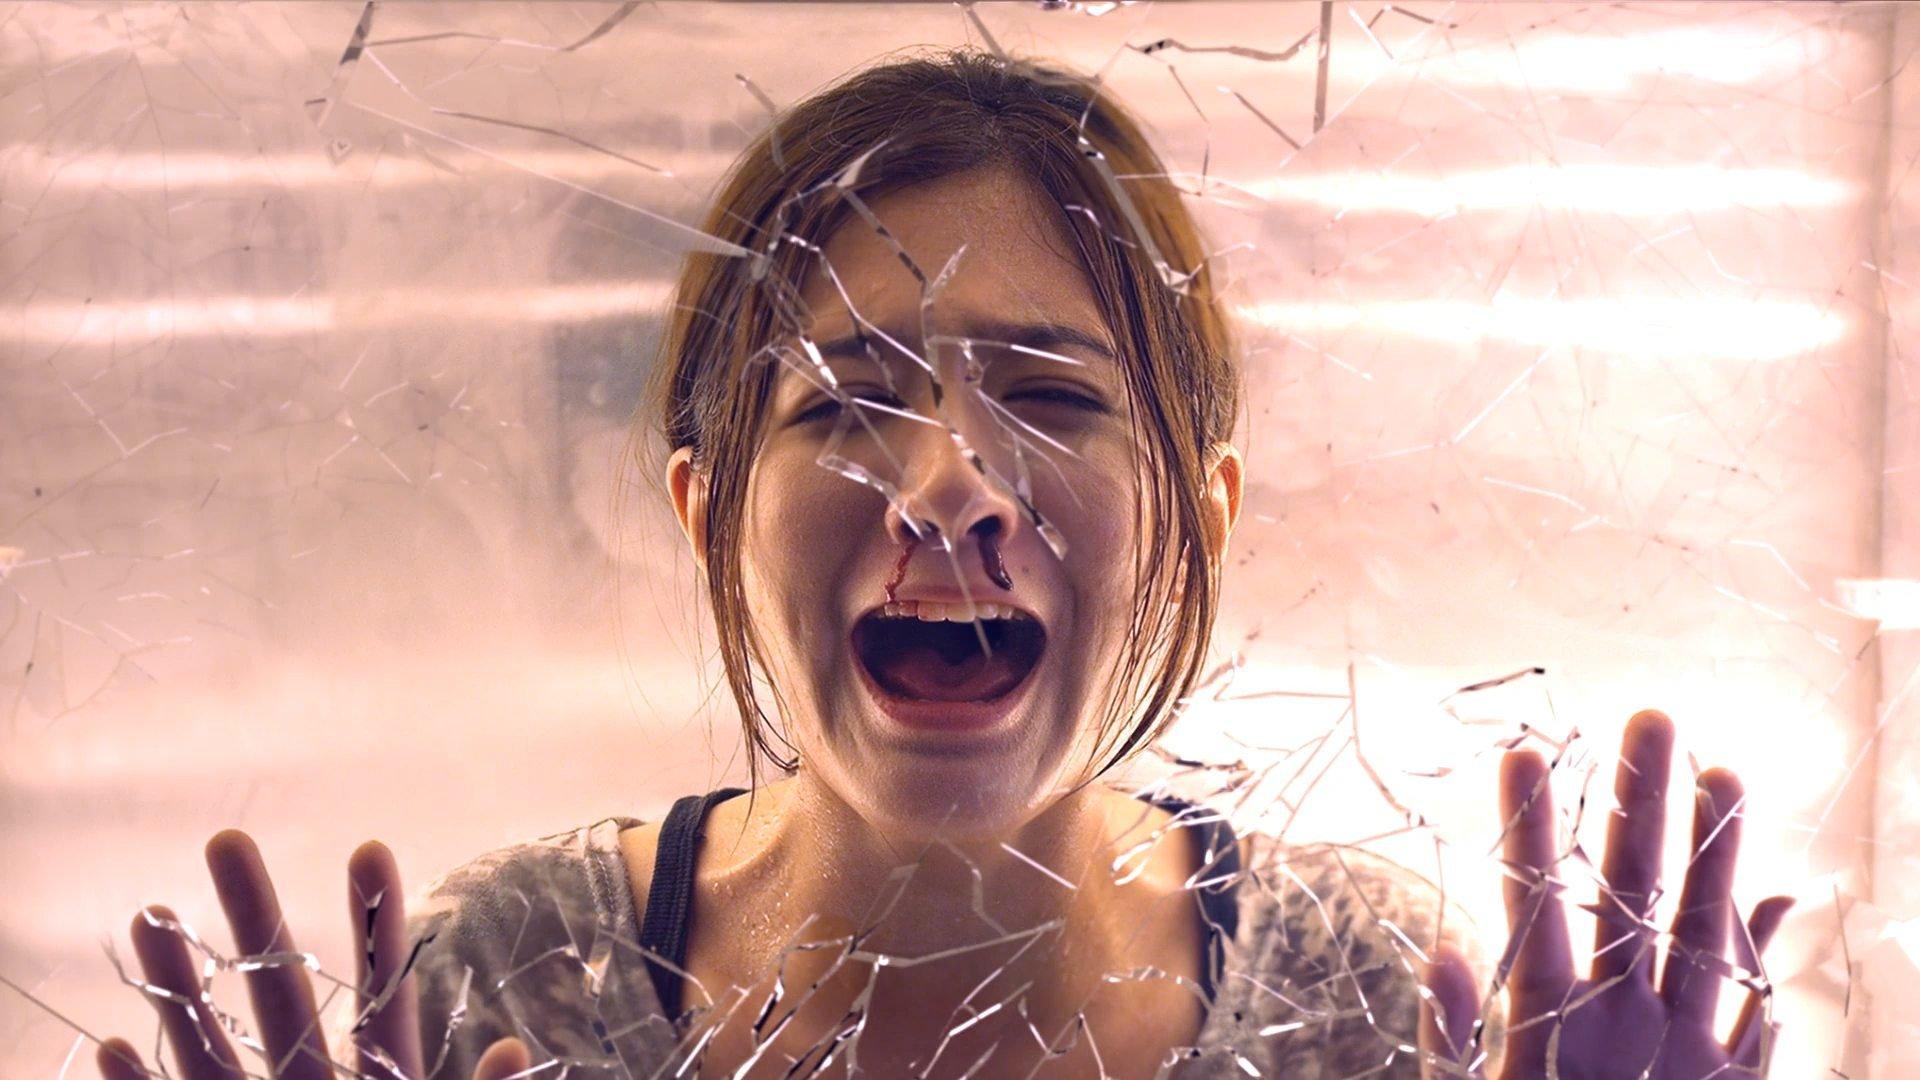 3d фильмы онлайн анаморфная горизонтальная стереопара